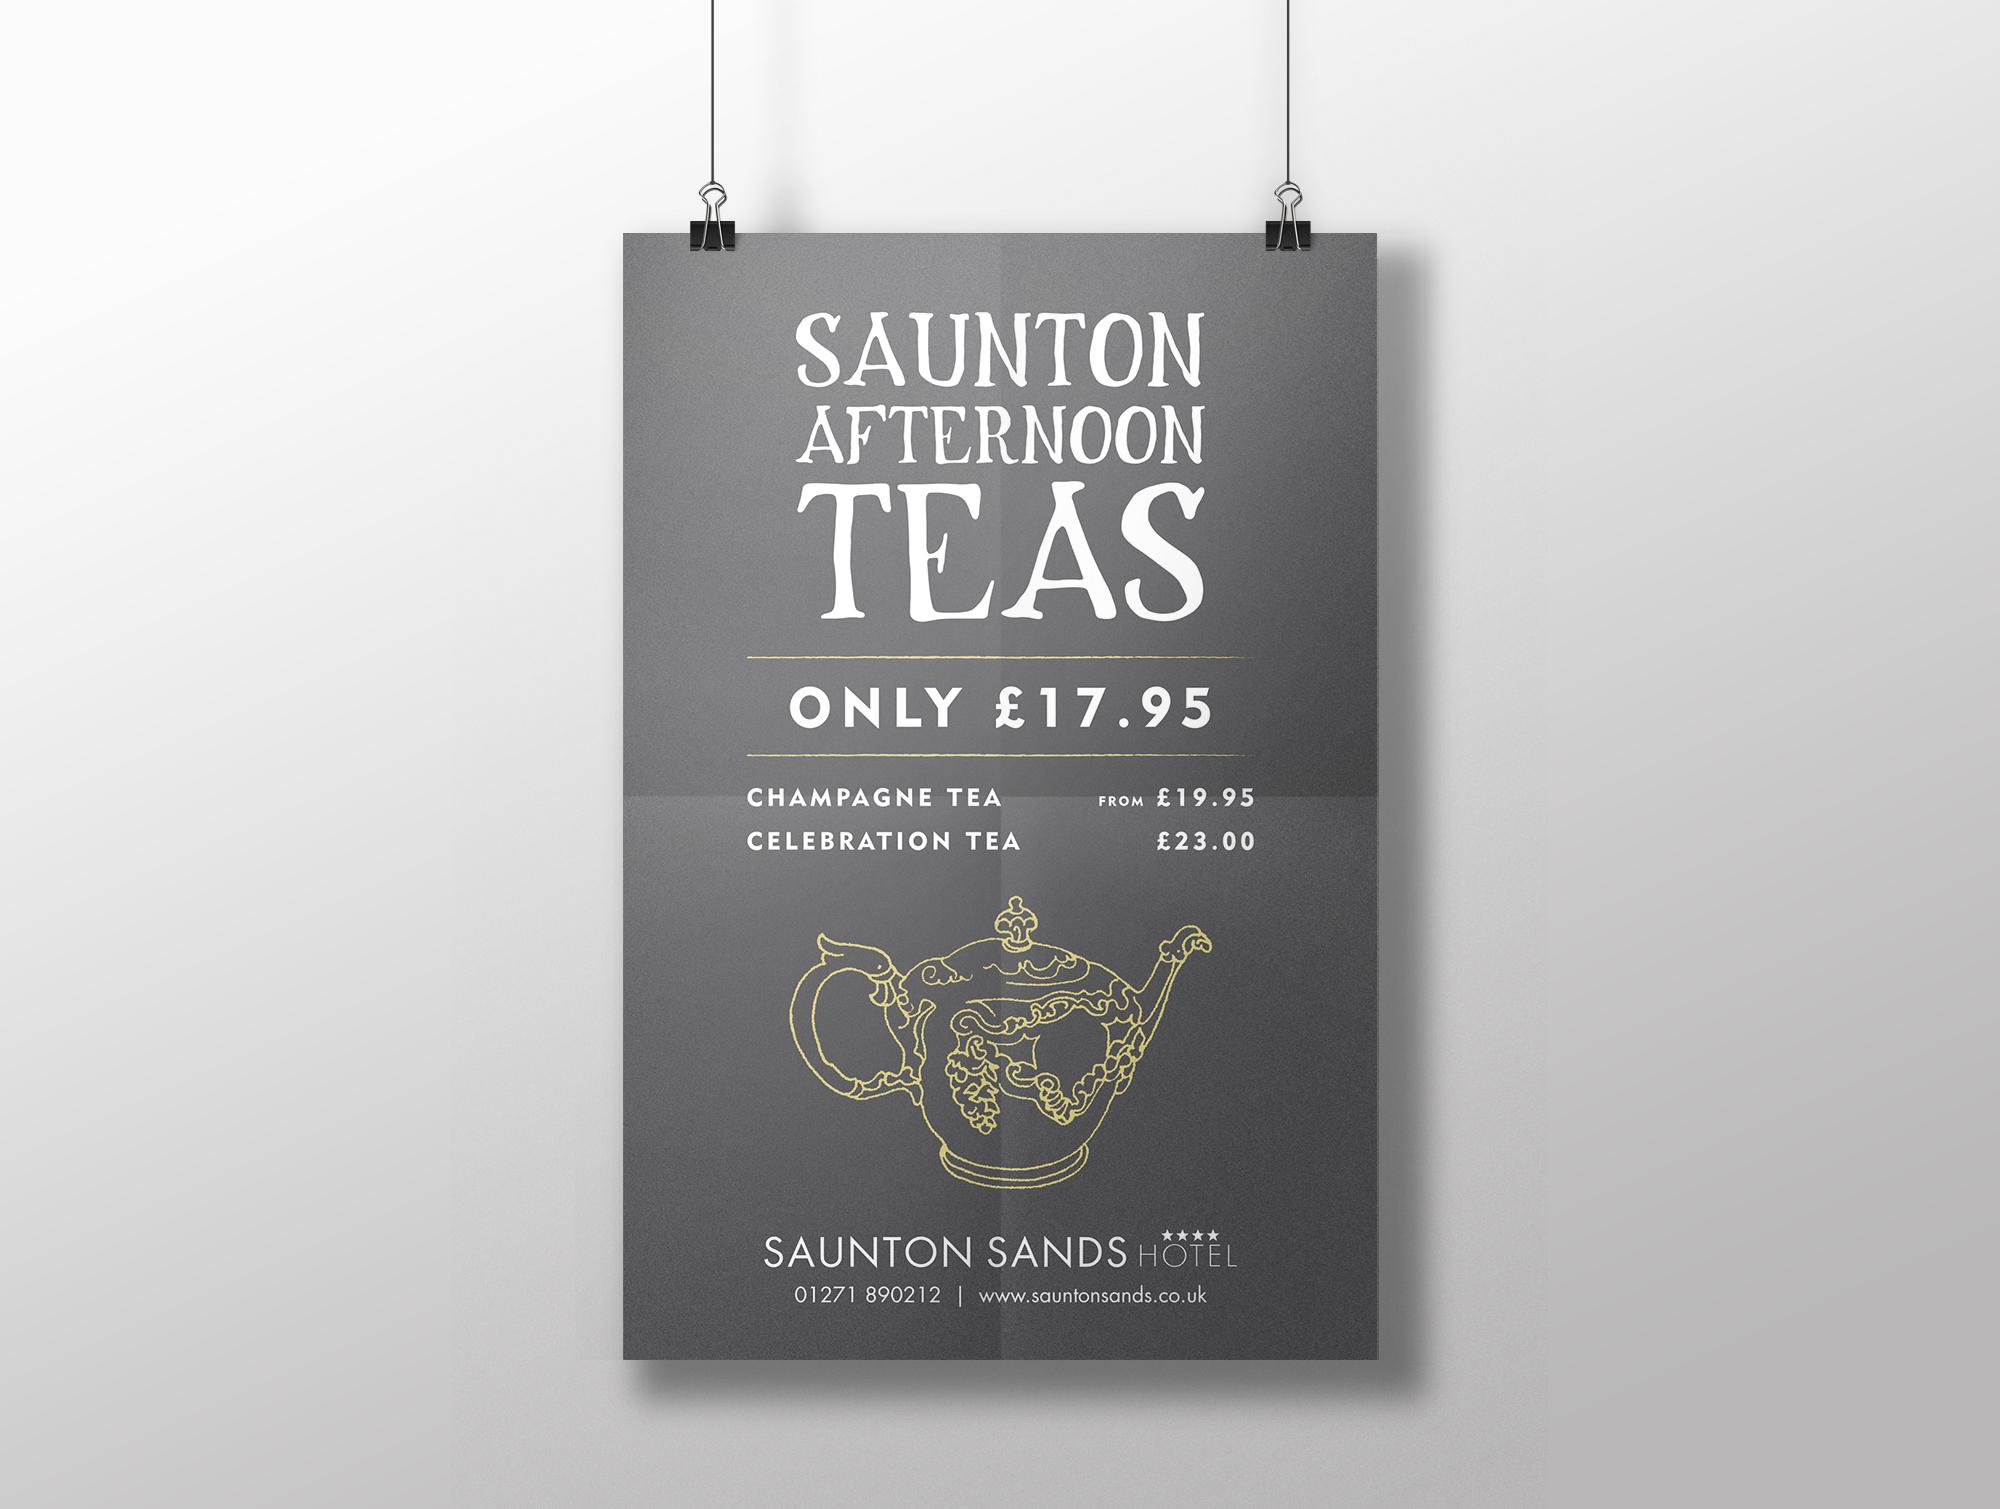 Saunton Poster - Afternoon Tea 1.jpg